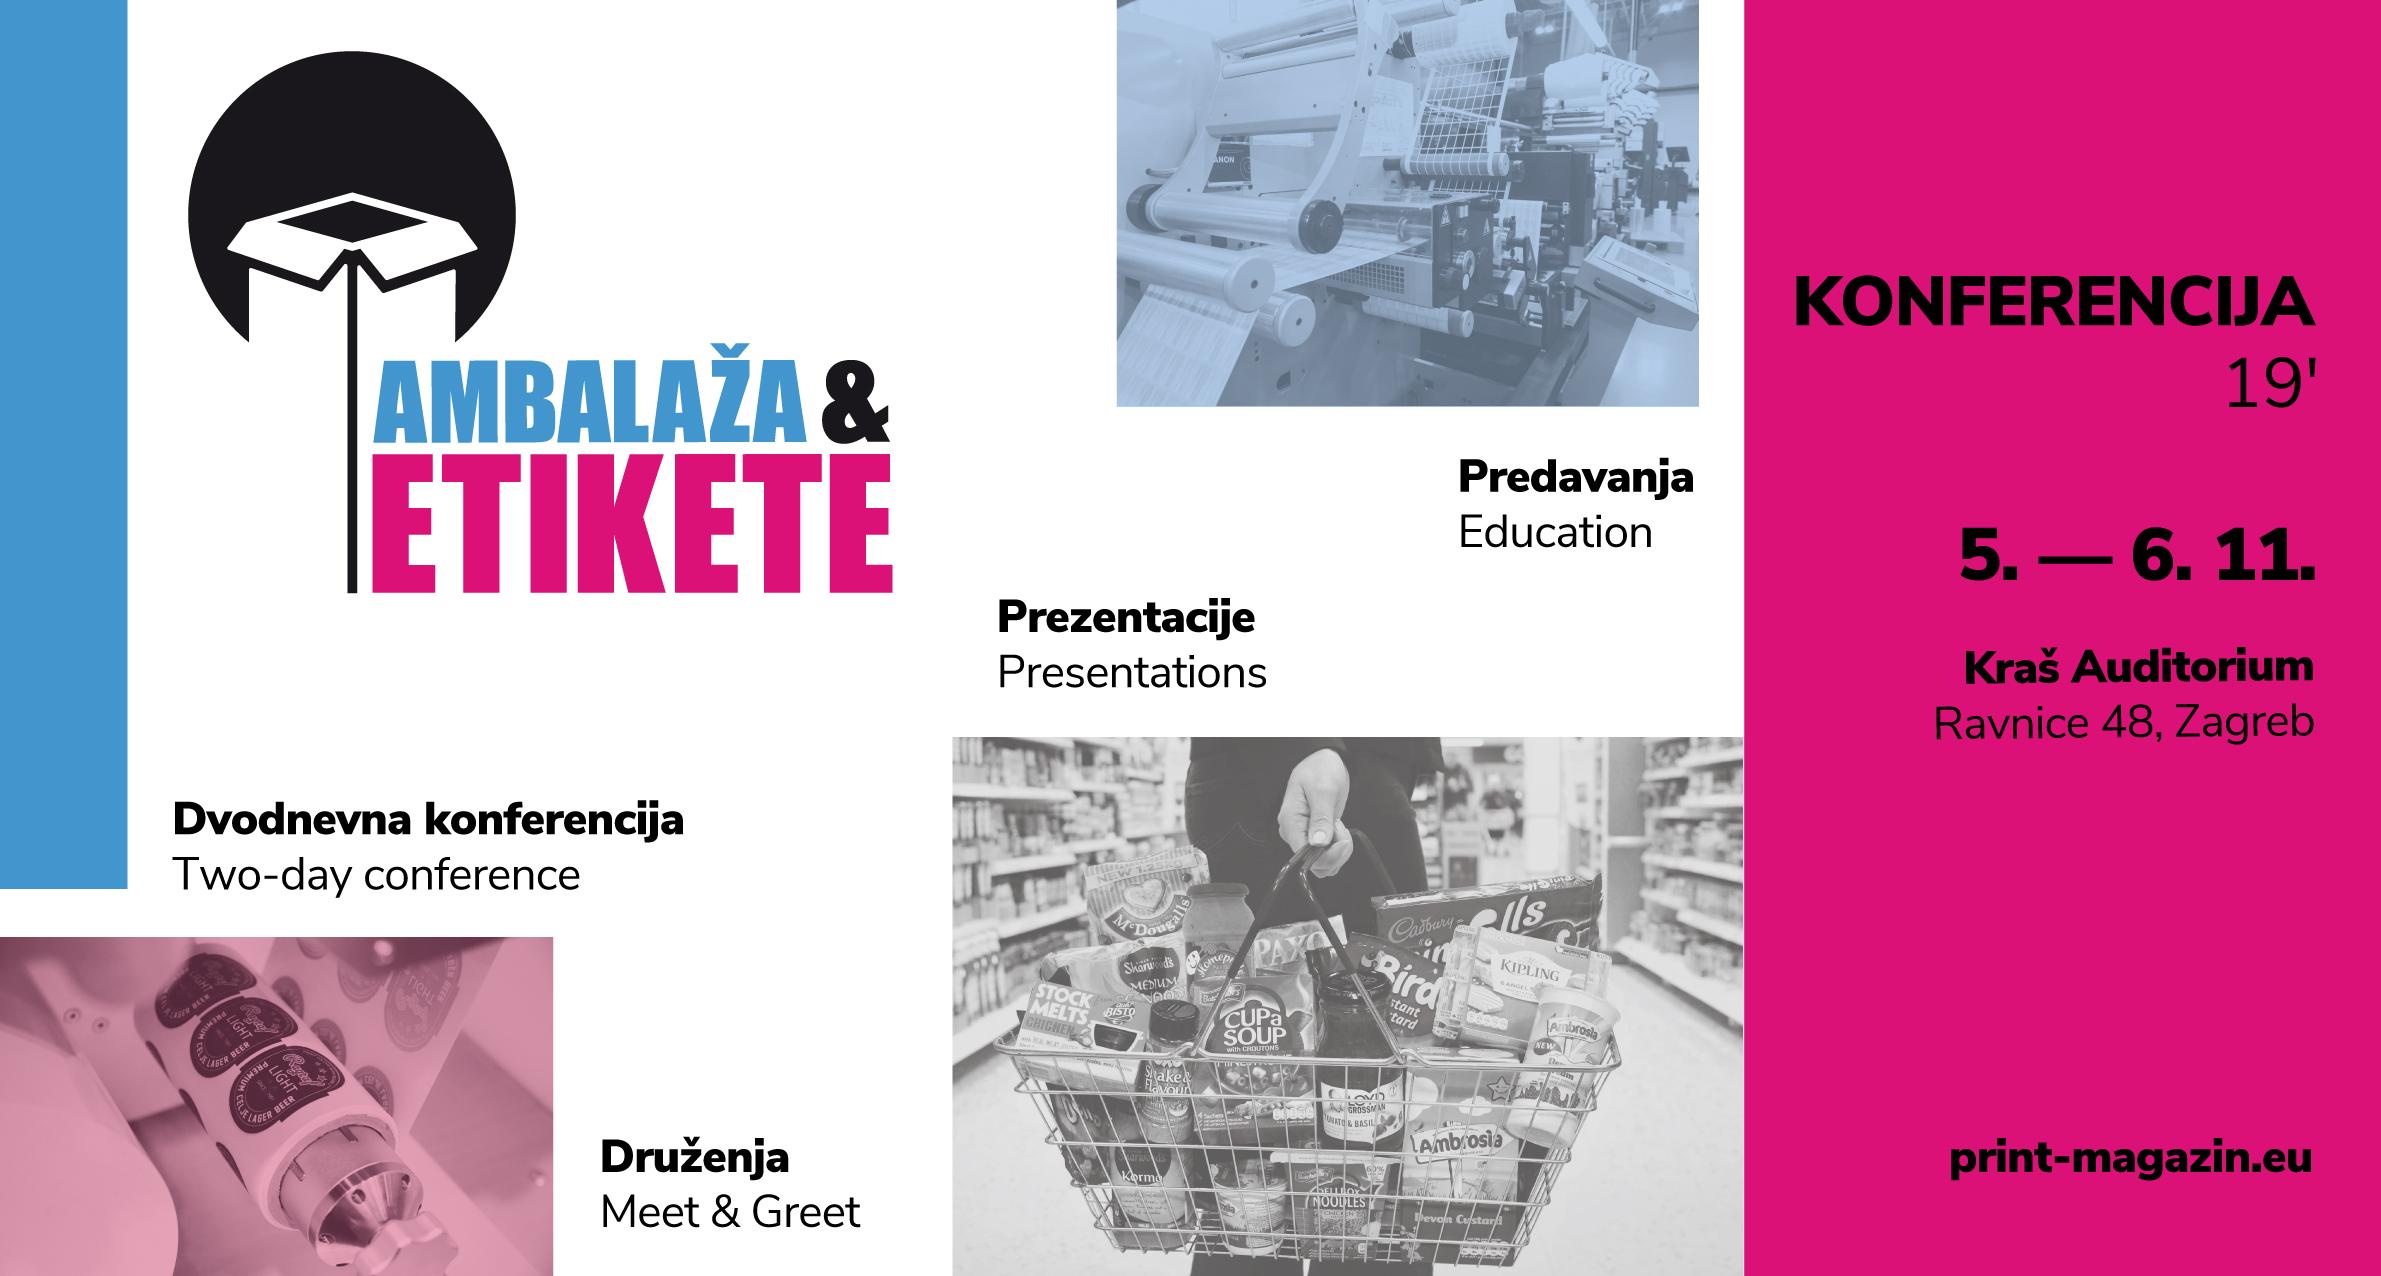 Ambalaza_i_etikete_konferencija_Print_Magazin